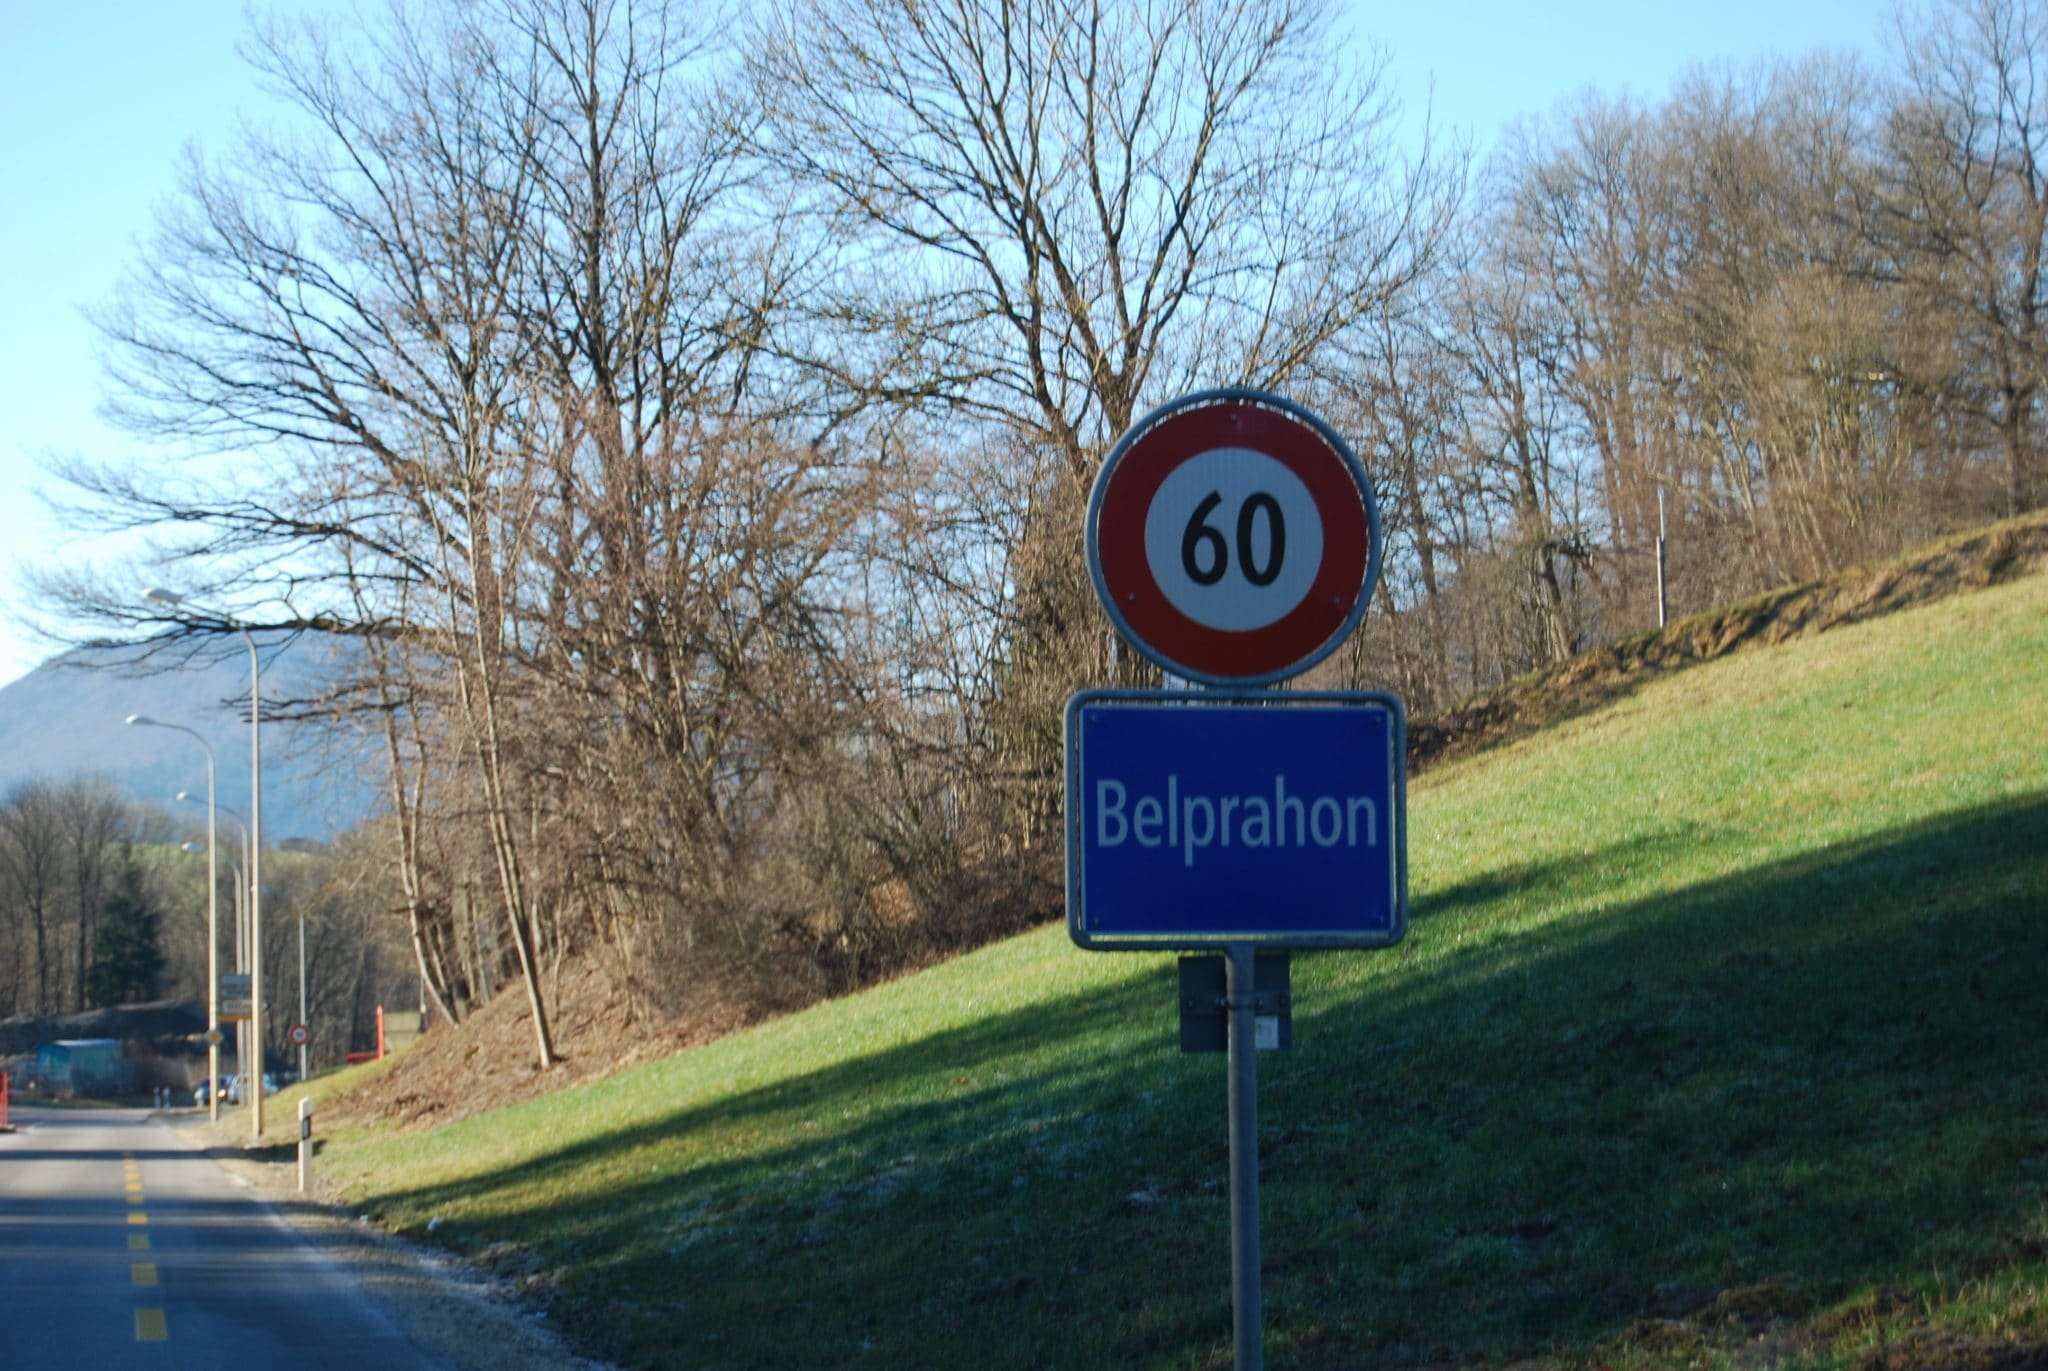 Belprahon